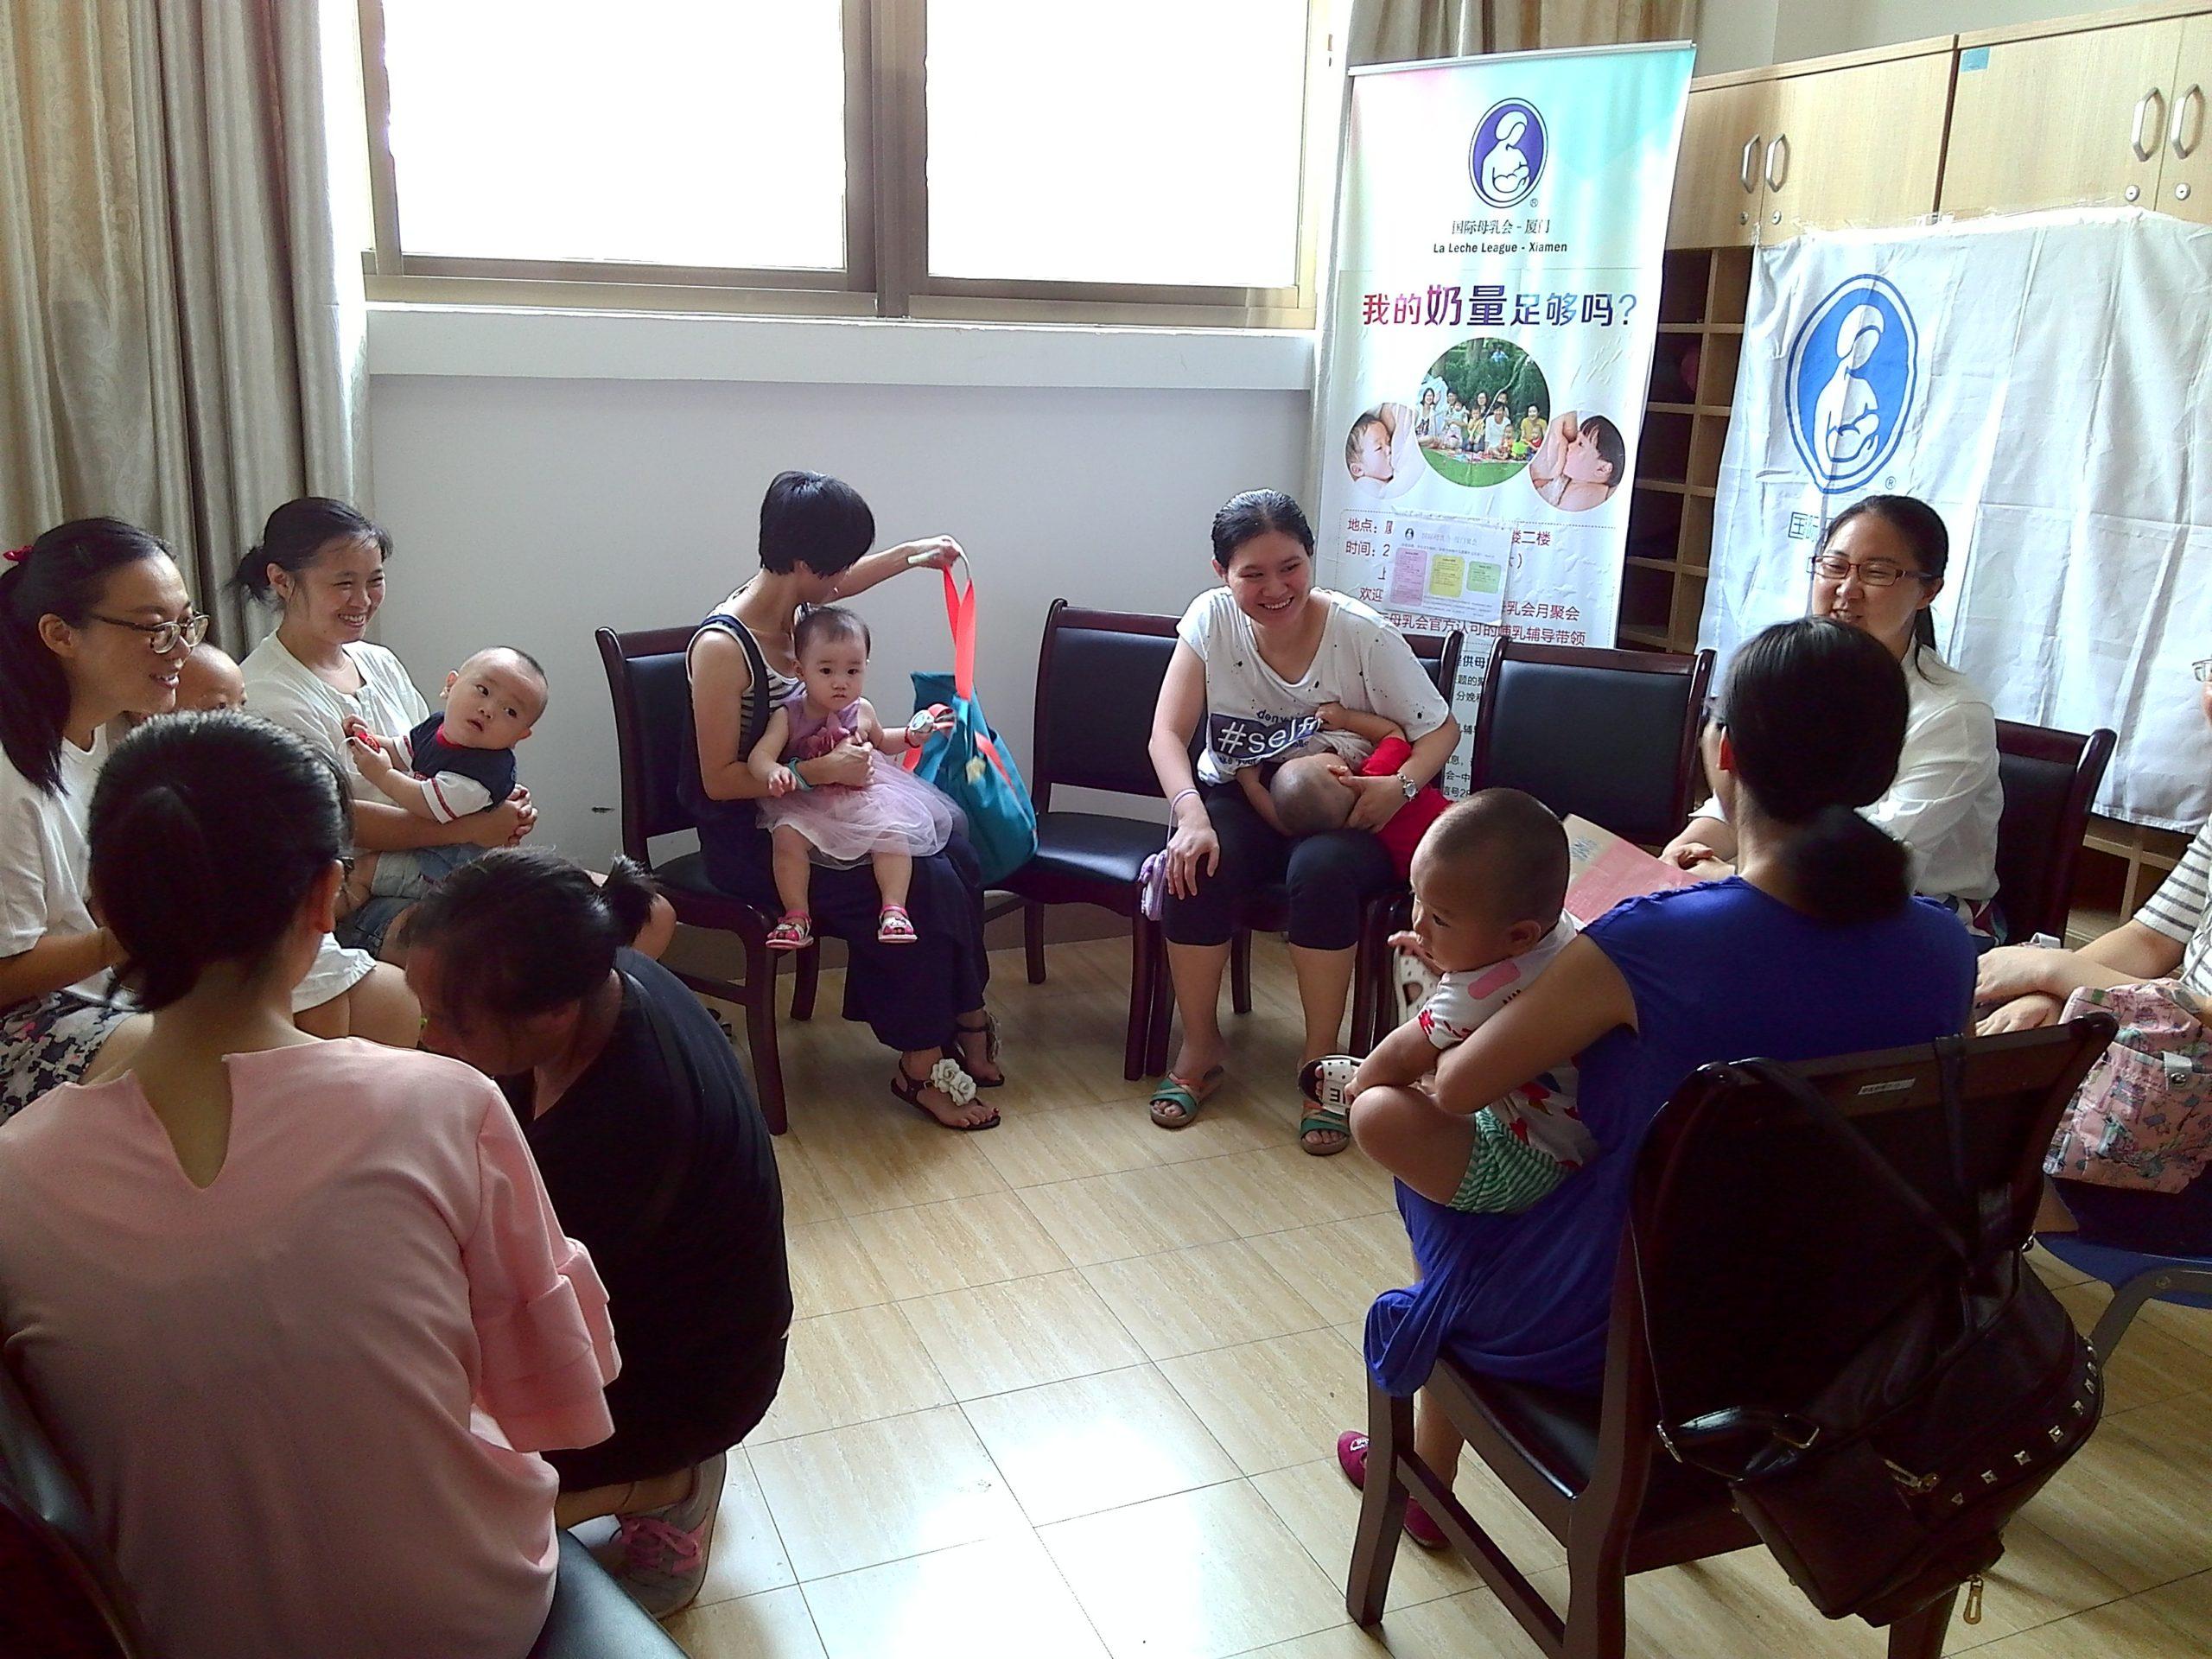 LLL meeting in Xiamen, China